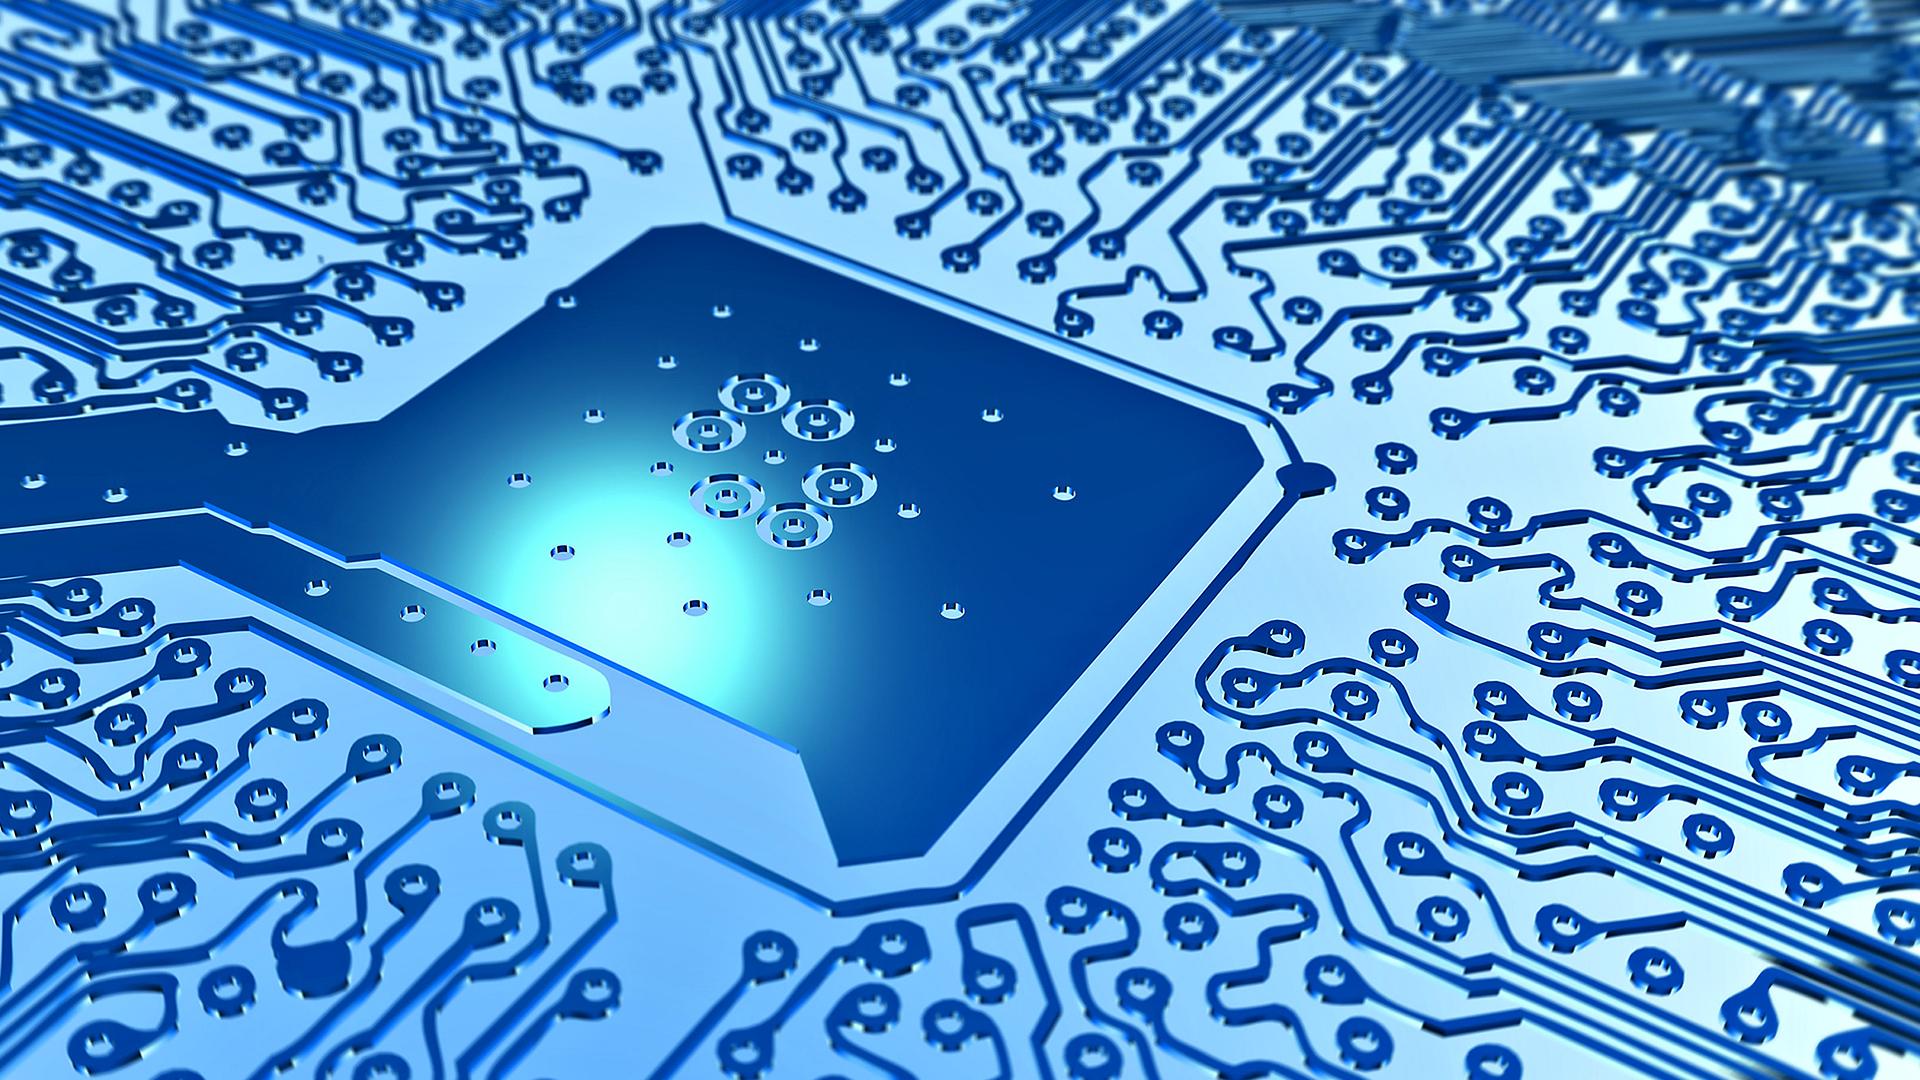 Circuit Board HD Desktop Wallpaper HD Desktop Wallpaper 1920x1080